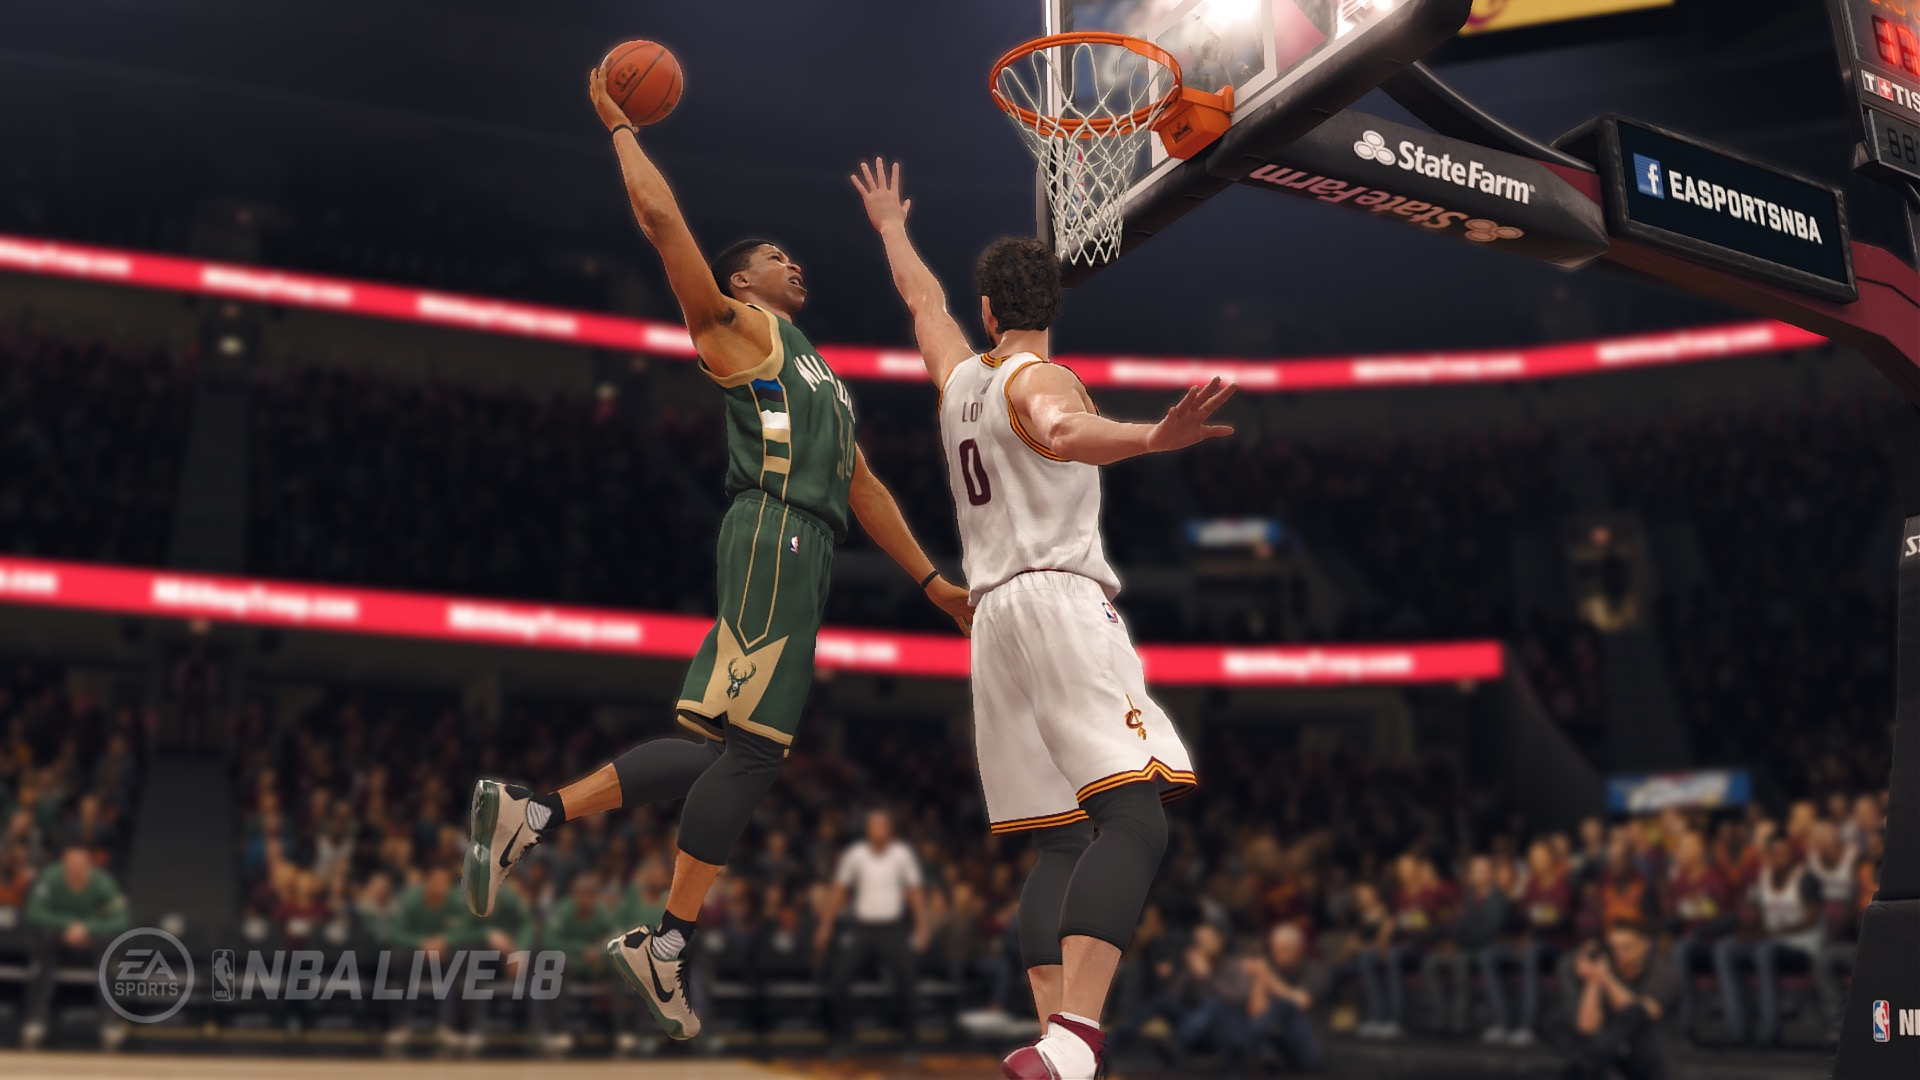 Nba Live  Basketball Wallpaper